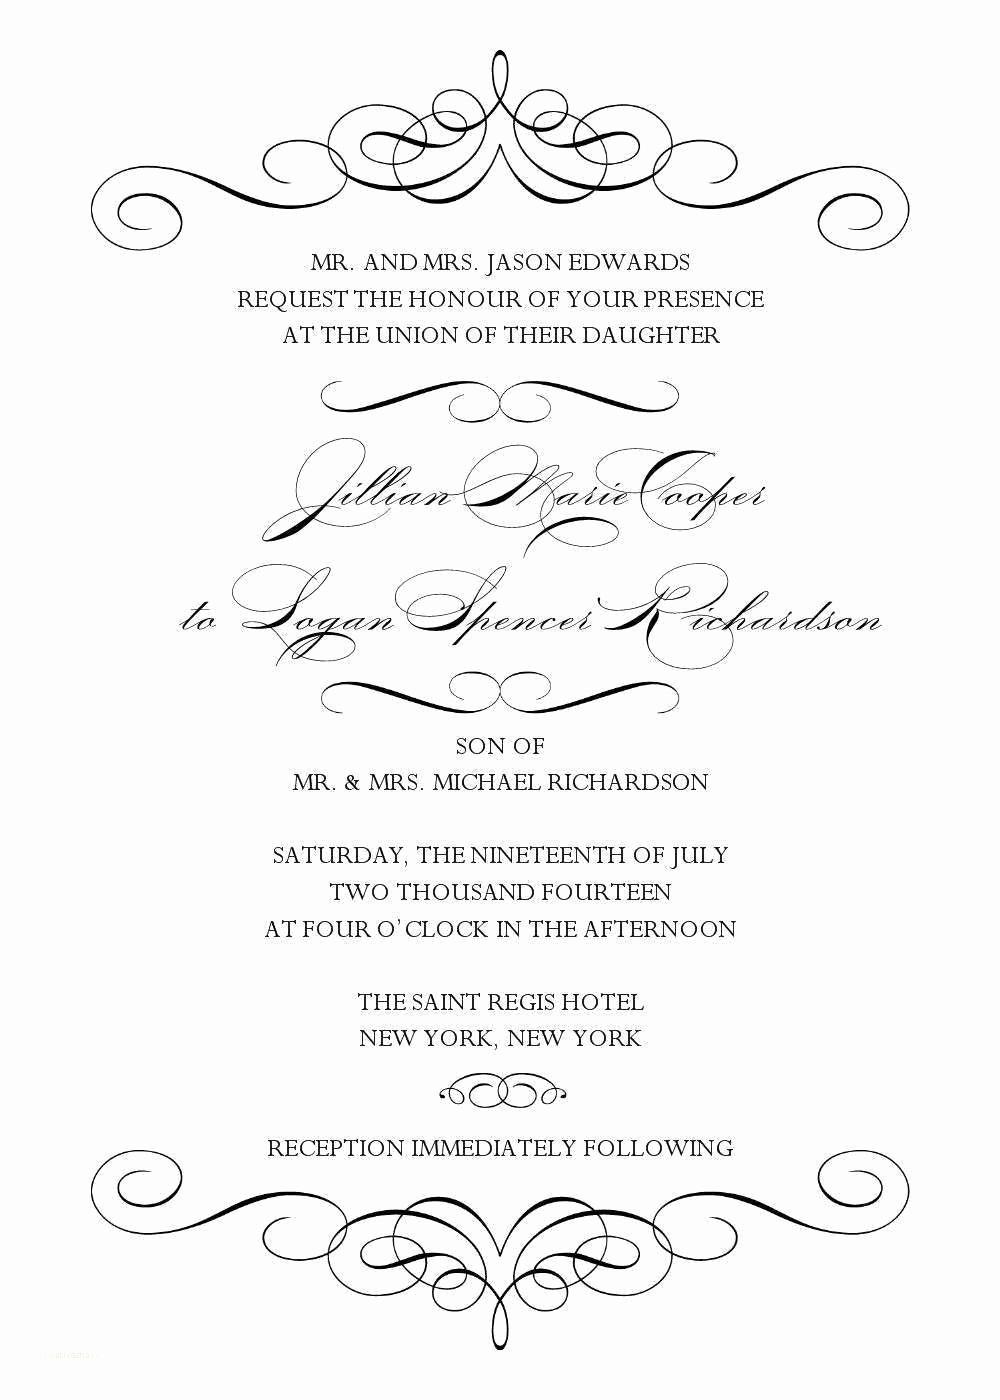 Blank Wedding Invitation Templates Fresh Blank Wedding Invitation Templates for Microsoft Word